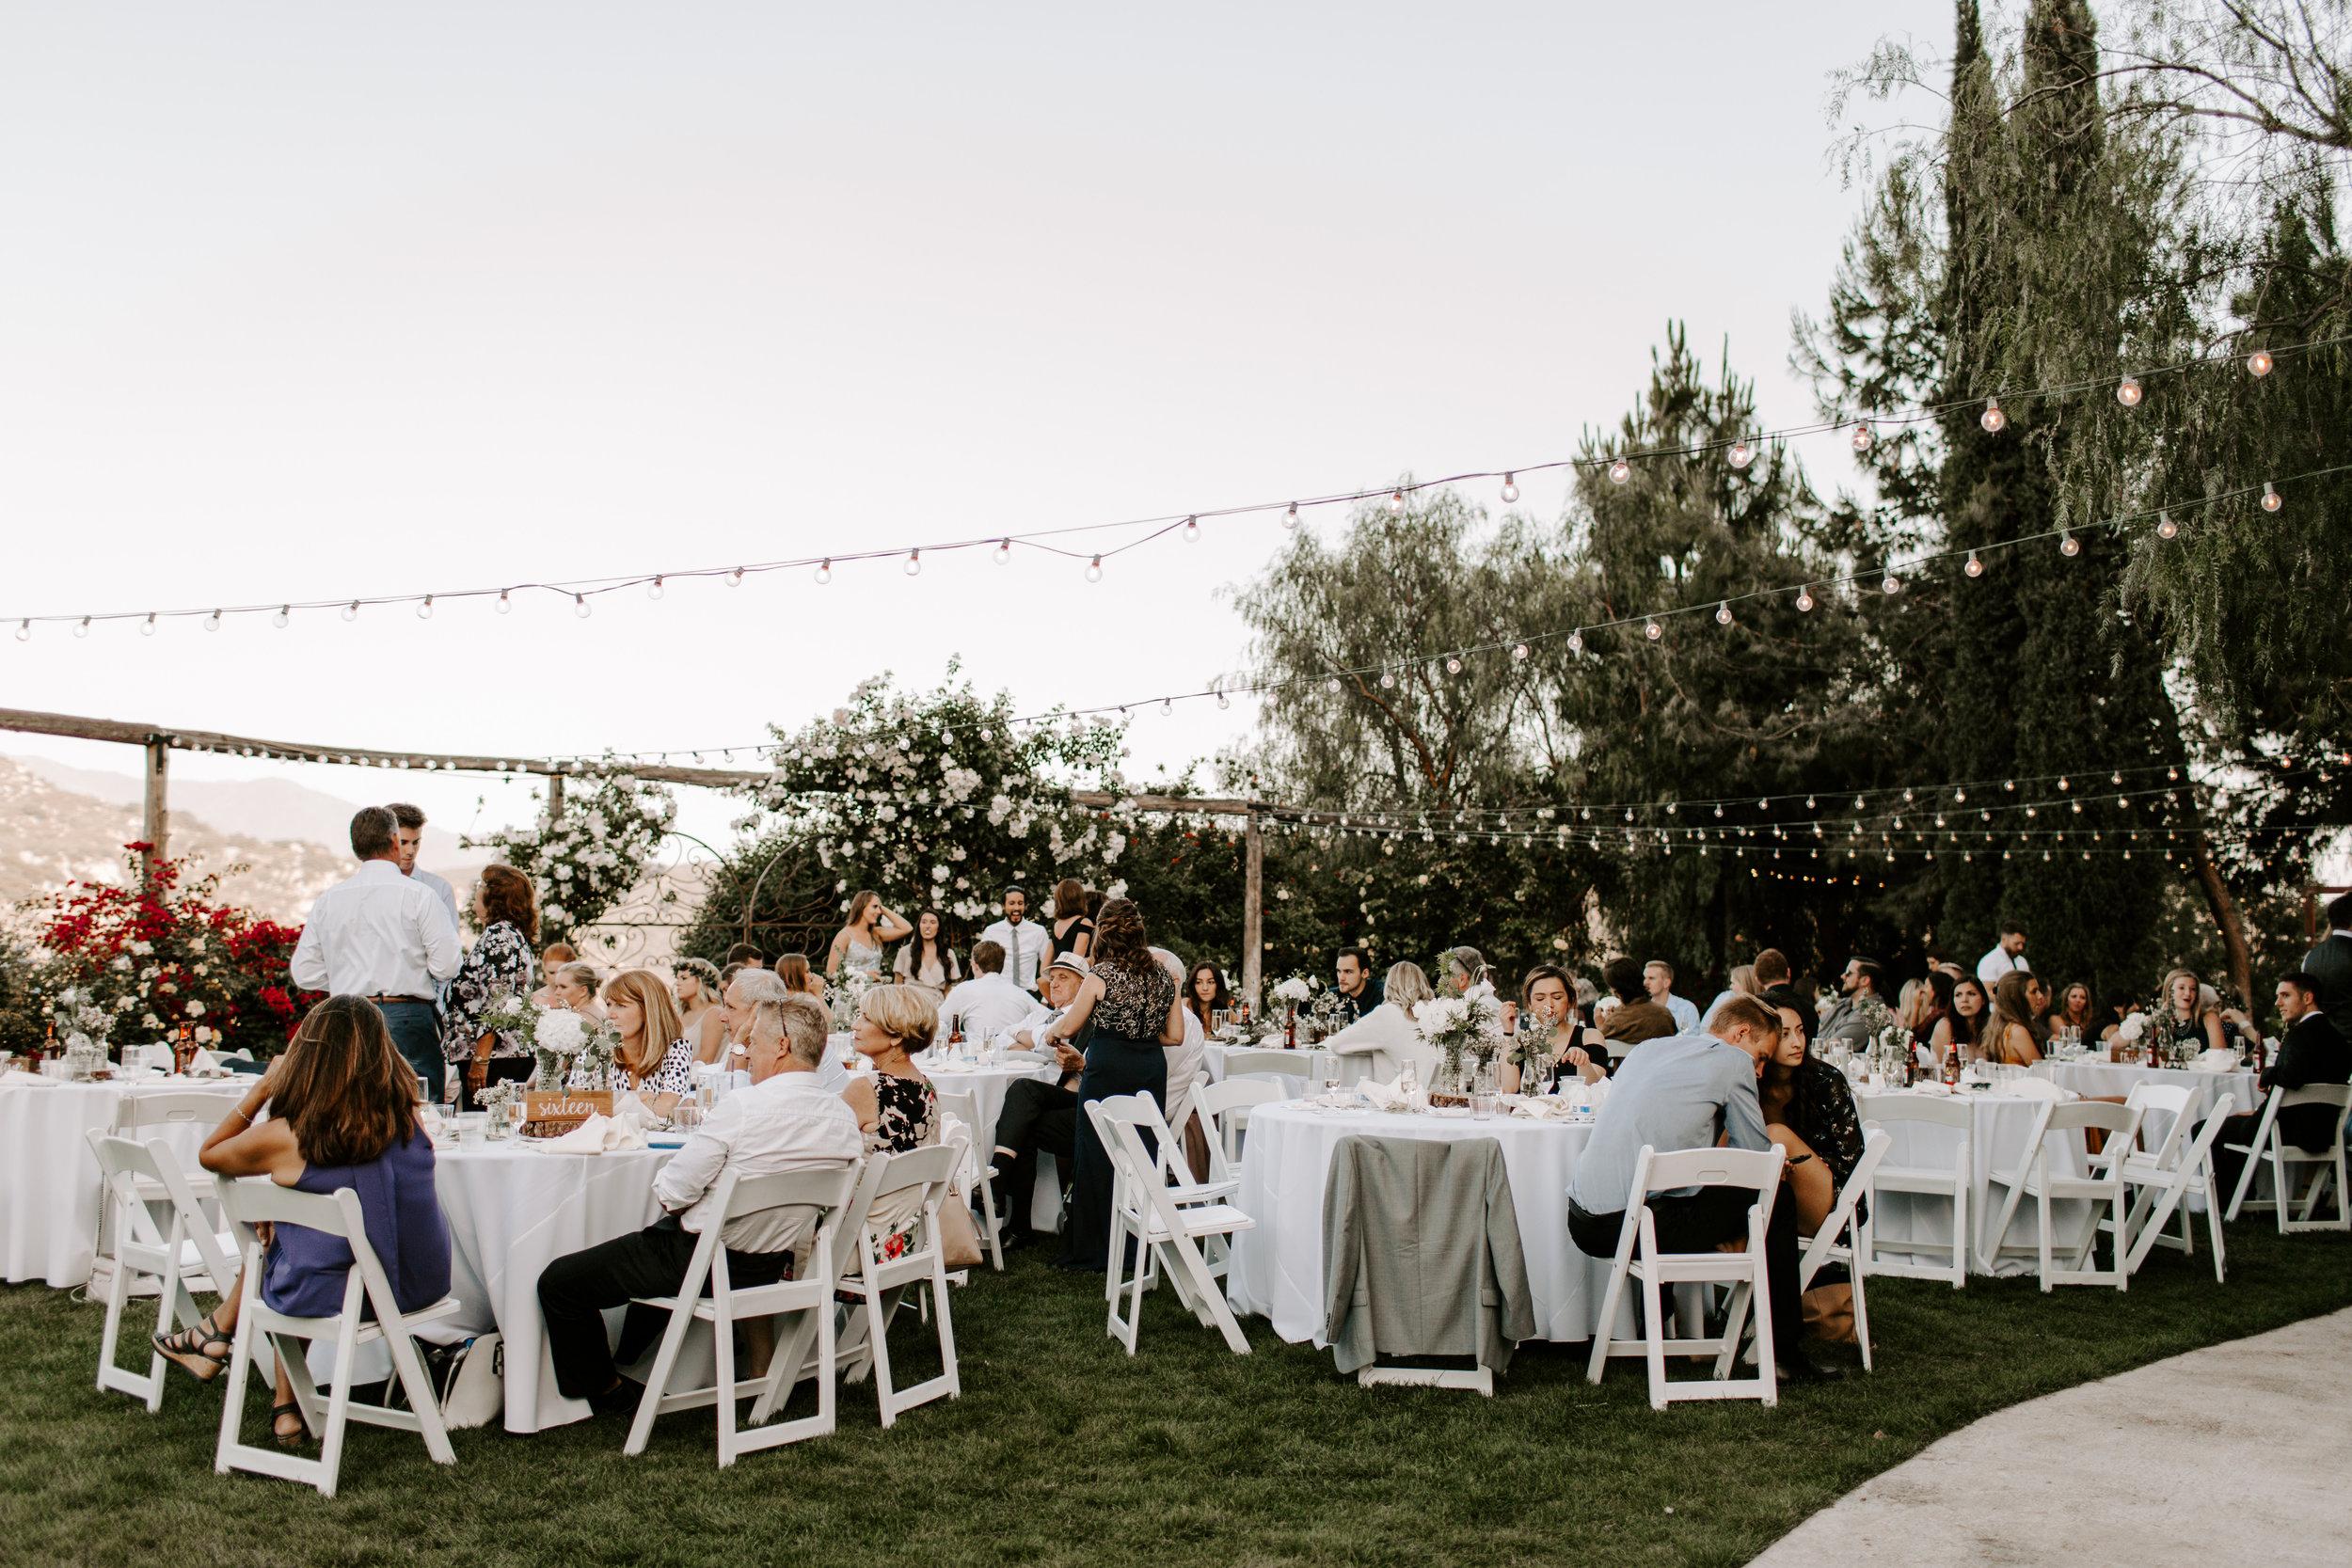 kate+zack_wedding_secludedgardenestate_temecula_madisonrylee_1106.jpg